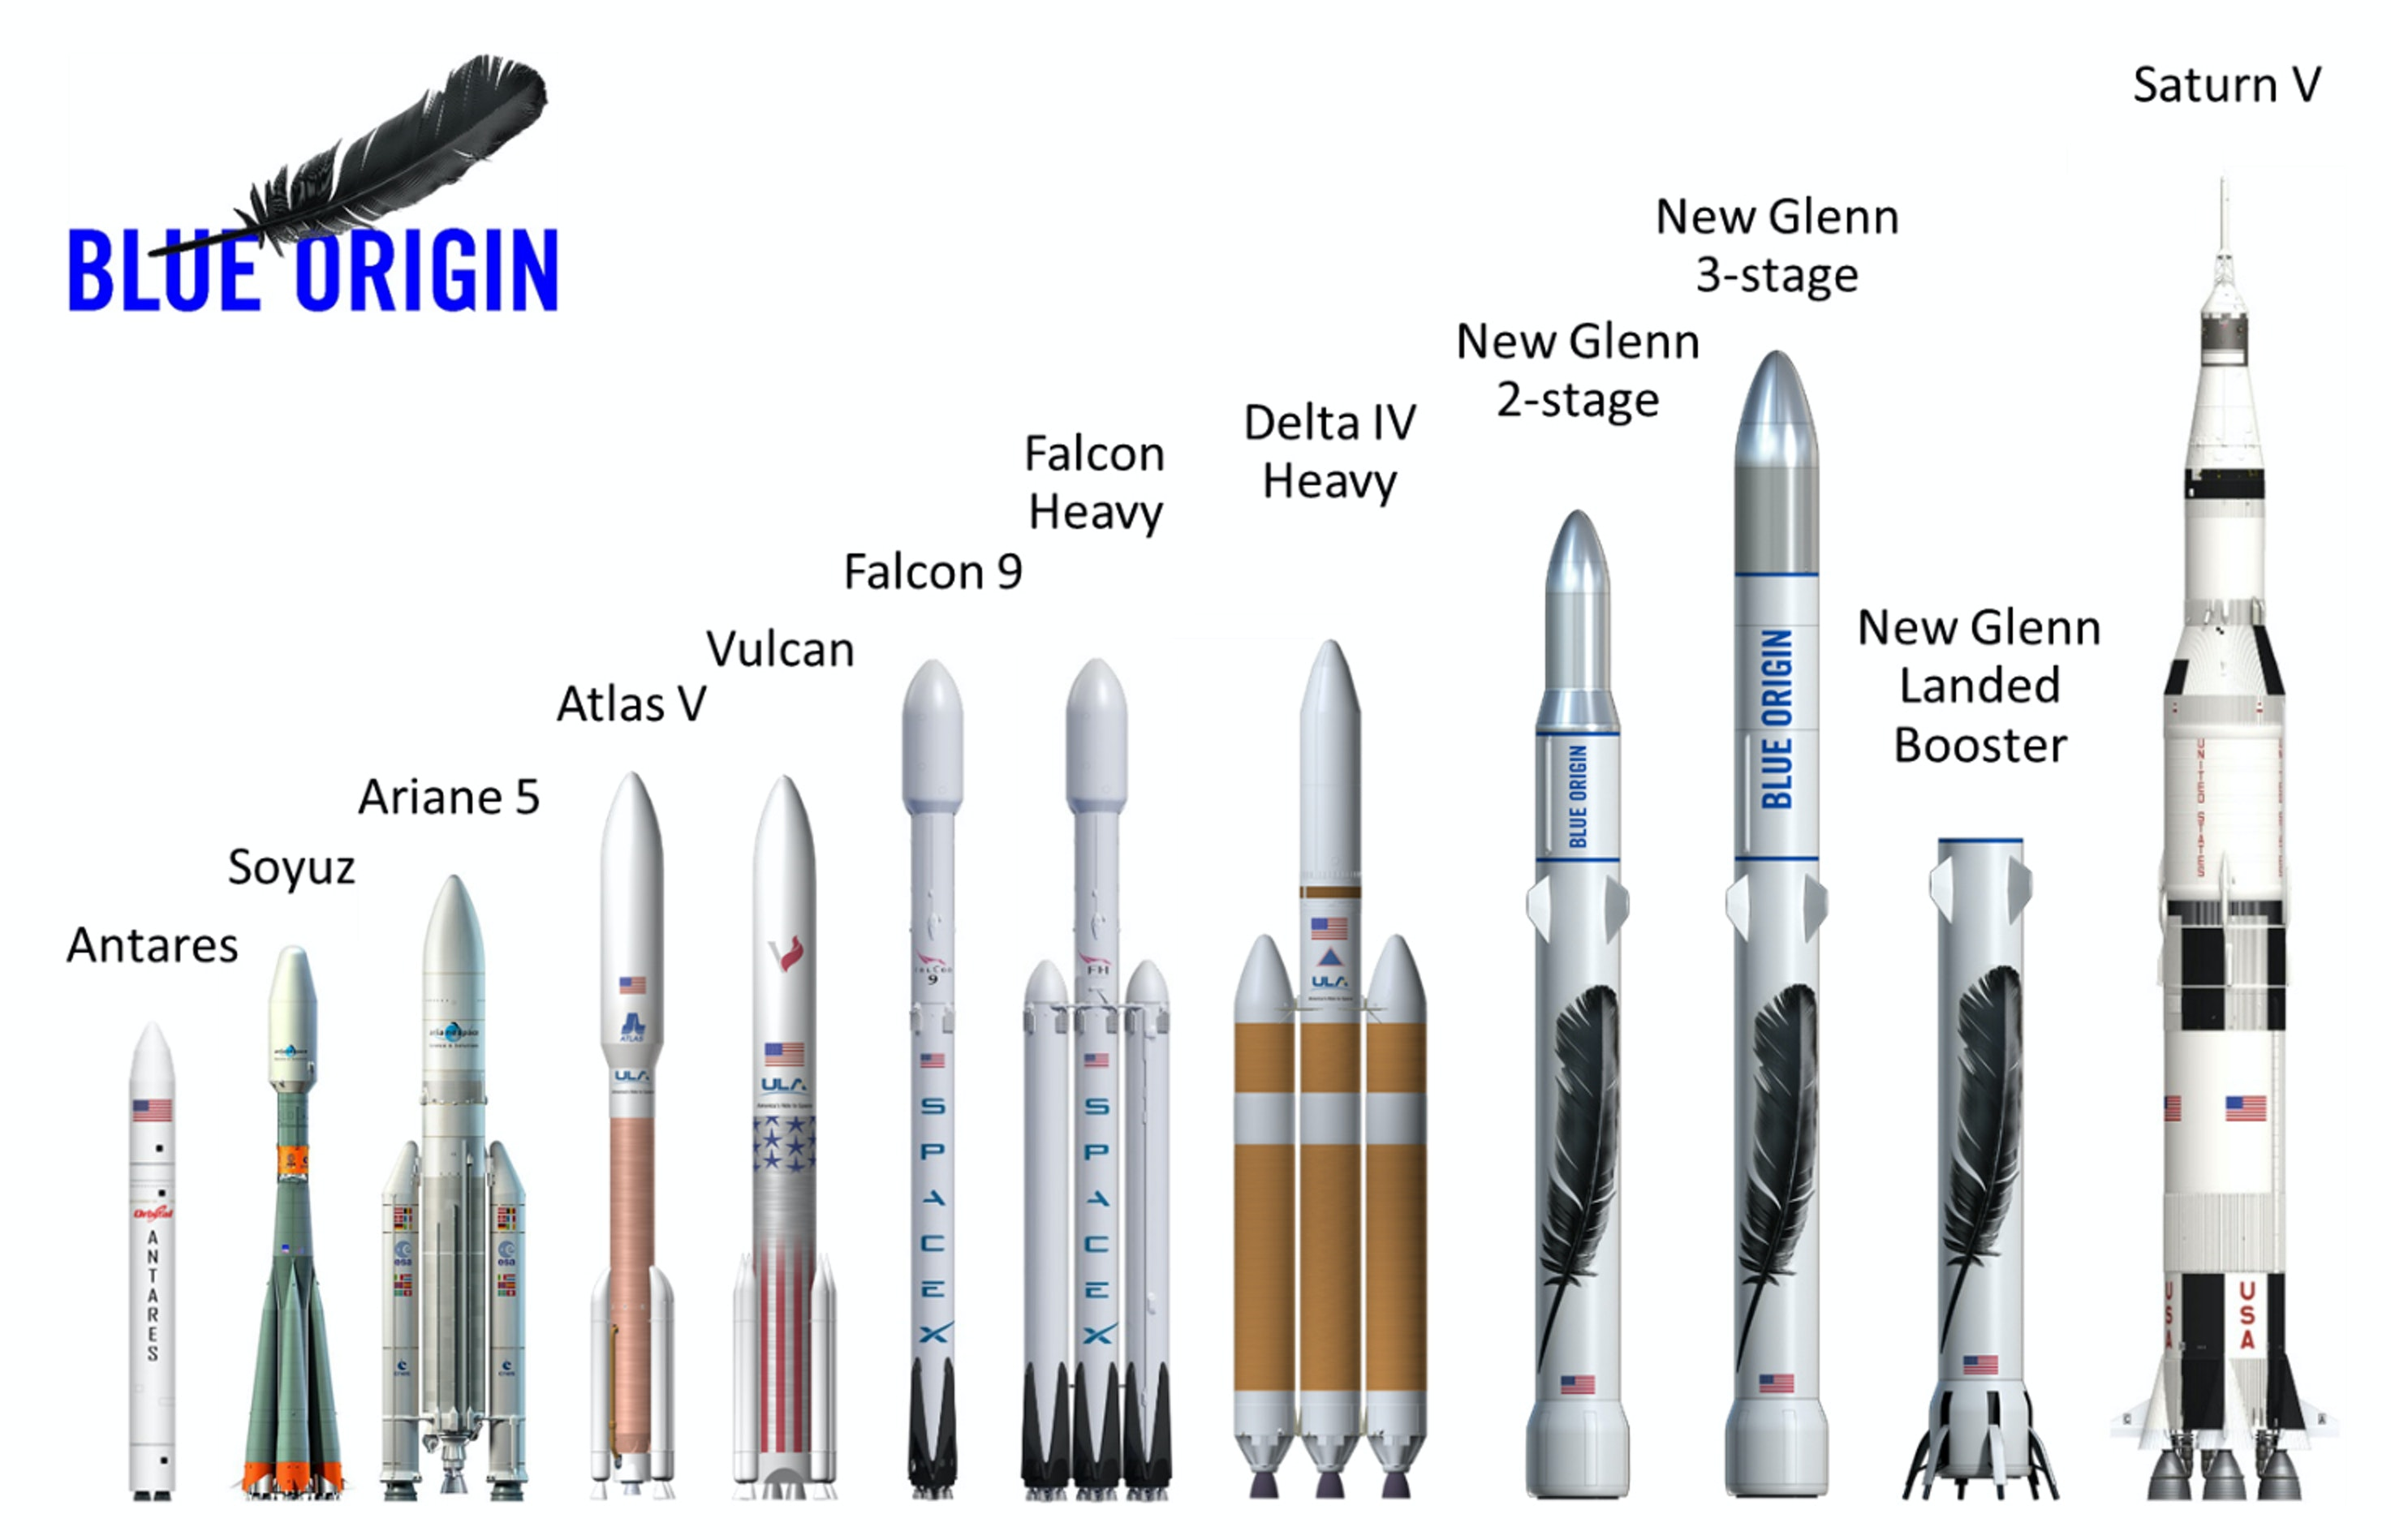 The New Glenn rockets